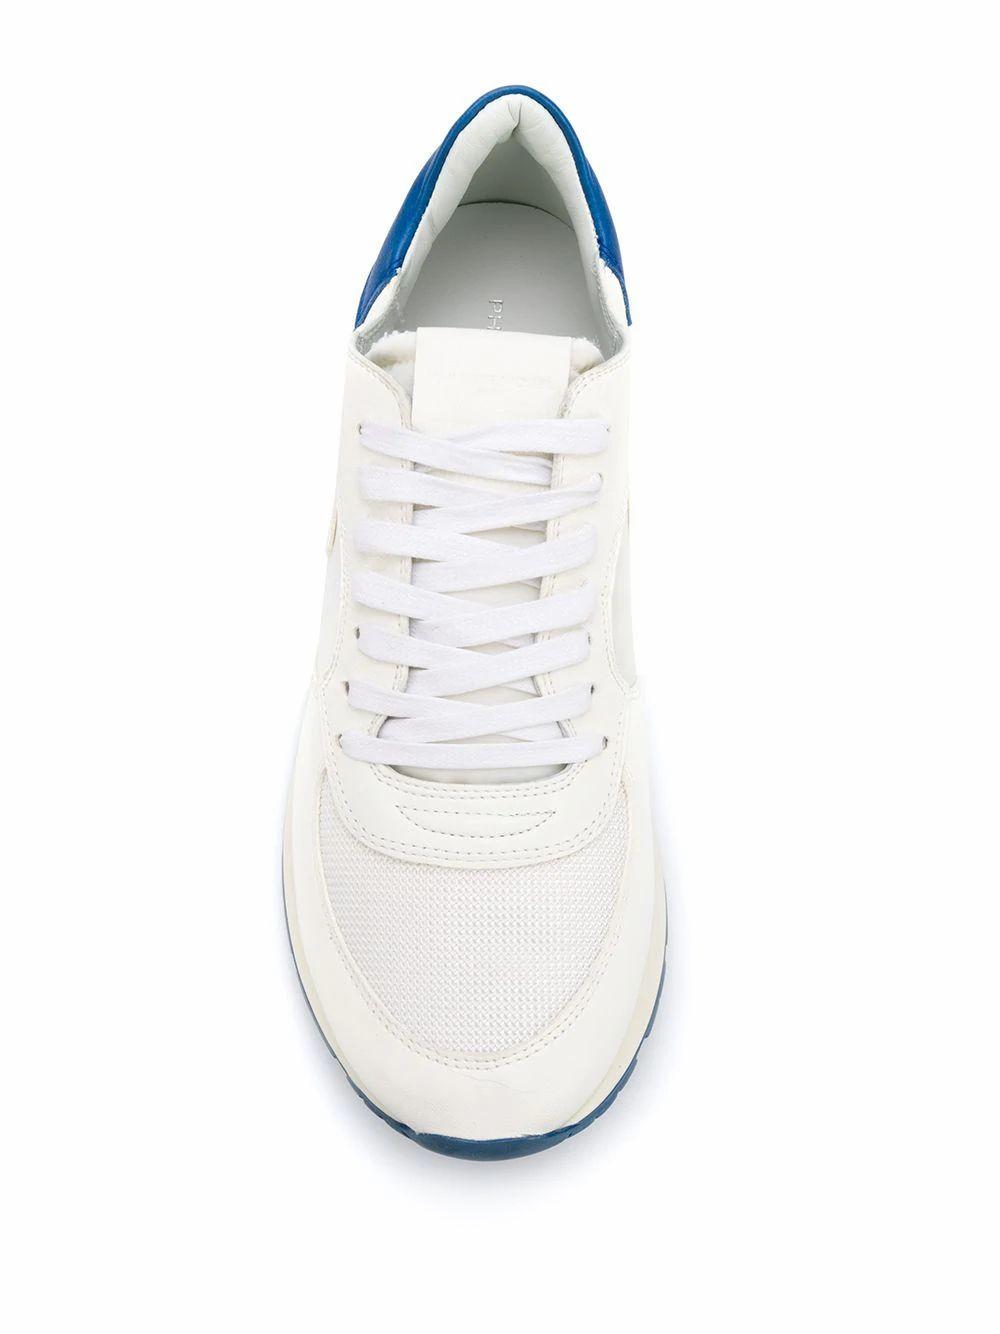 PHILIPPE MODEL MEN'S NTLUXT14 WHITE LEATHER SNEAKERS